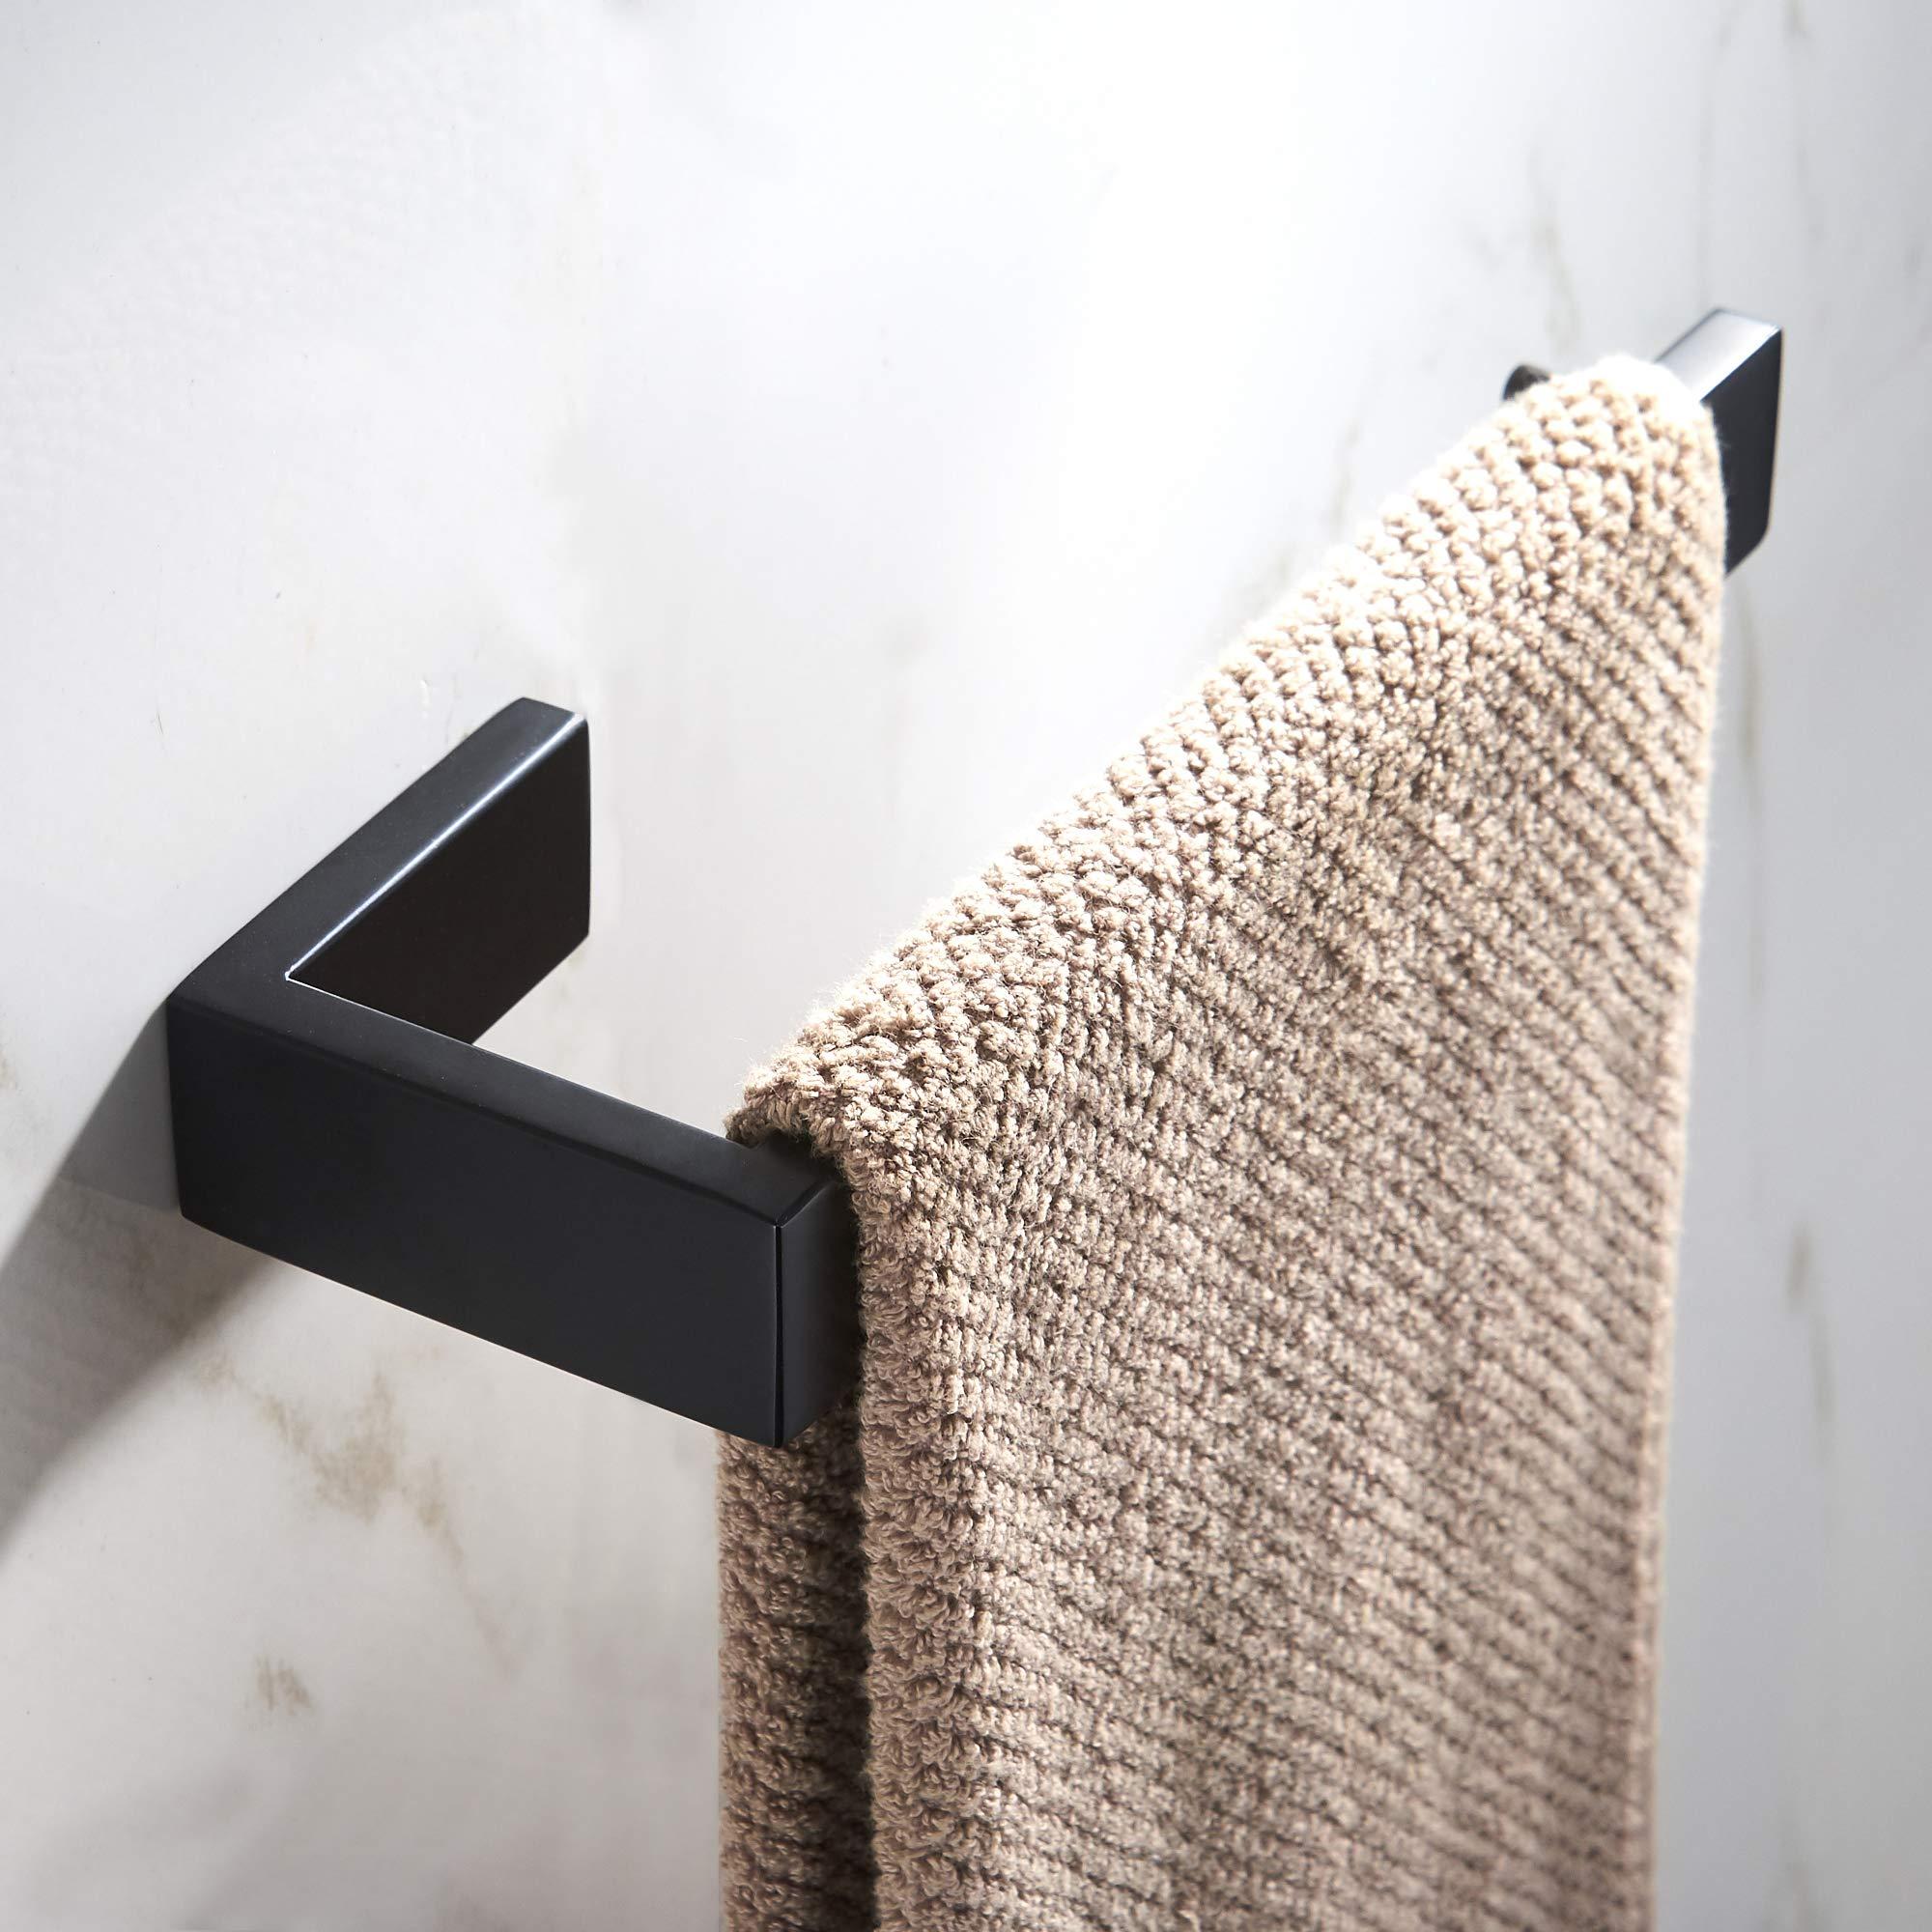 JunSun Towel Ring Stainless Steel Towel Holder Contemporary Bathroom Hardware Towel Bar for Bathroom Lavatory Wall Mounted, Matt Black